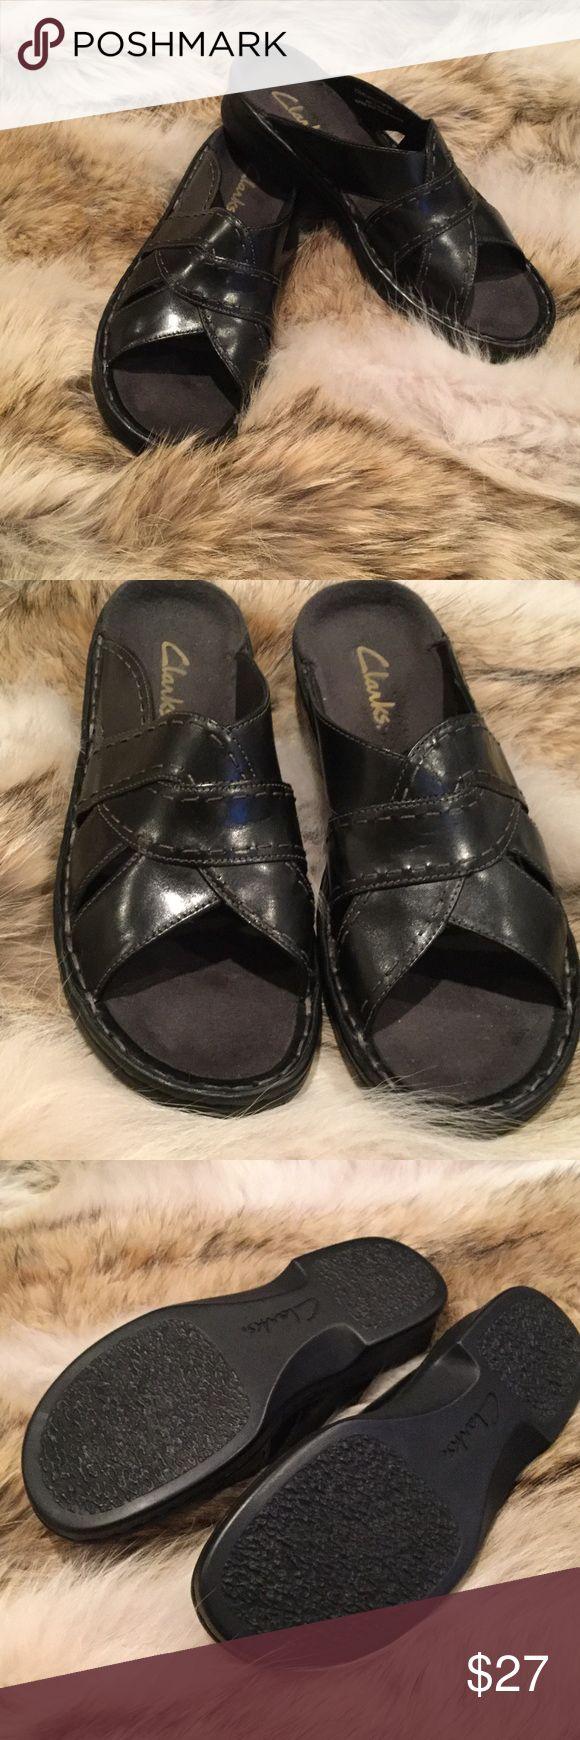 Ladies Clarks sandals black Ladies black. Leather Clarks sandal size 9 worn  one time. Flat style slide on Clarks Shoes Sandals